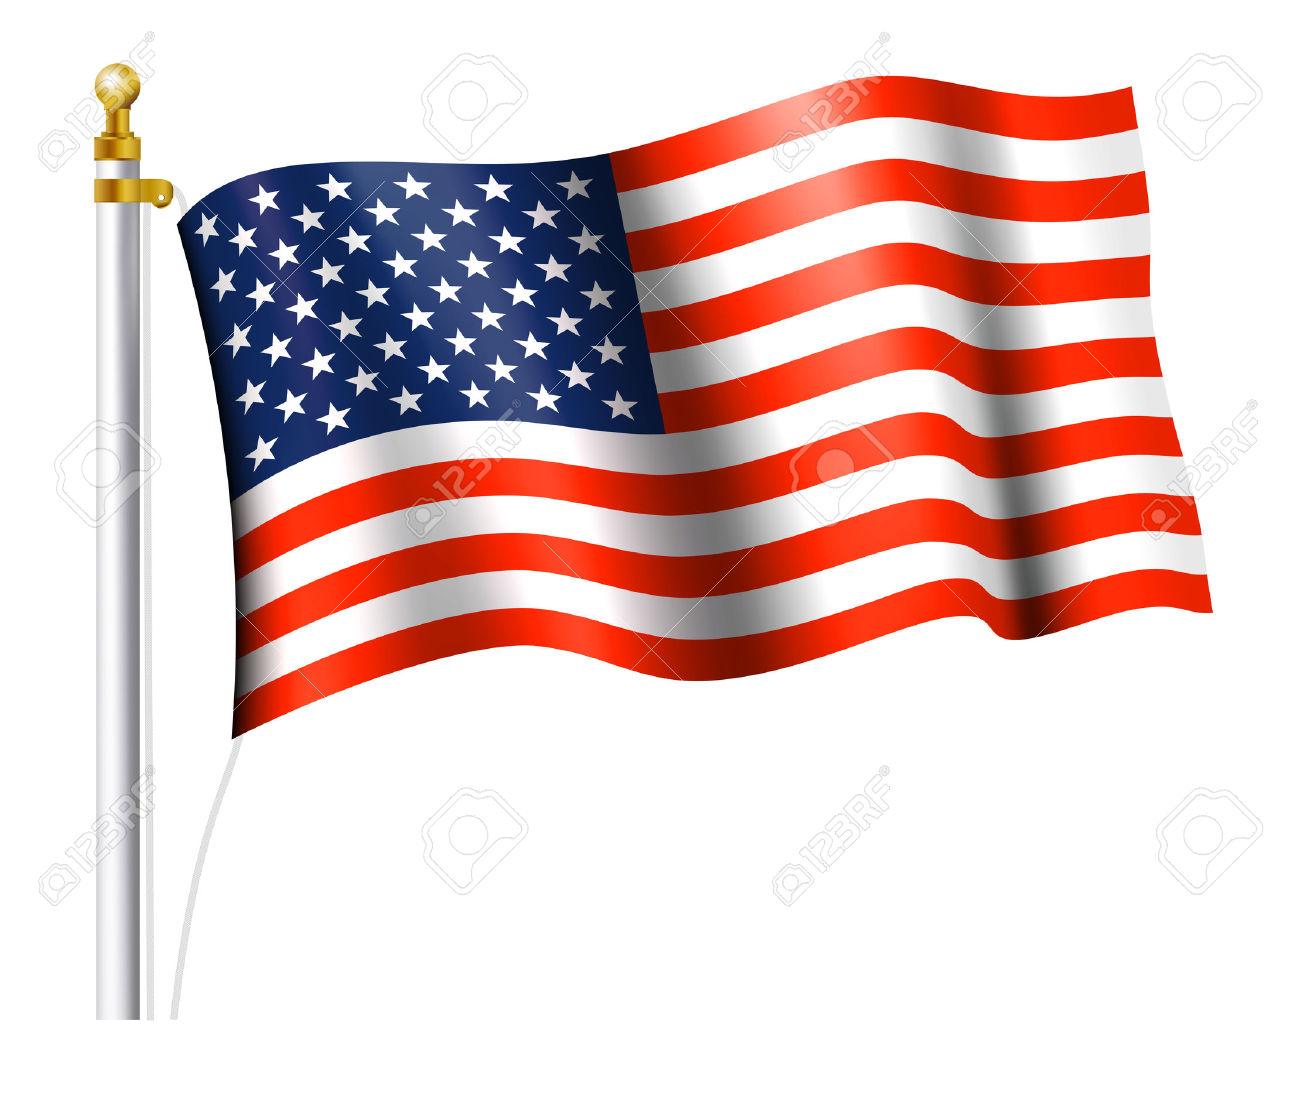 Americano flag clipart.